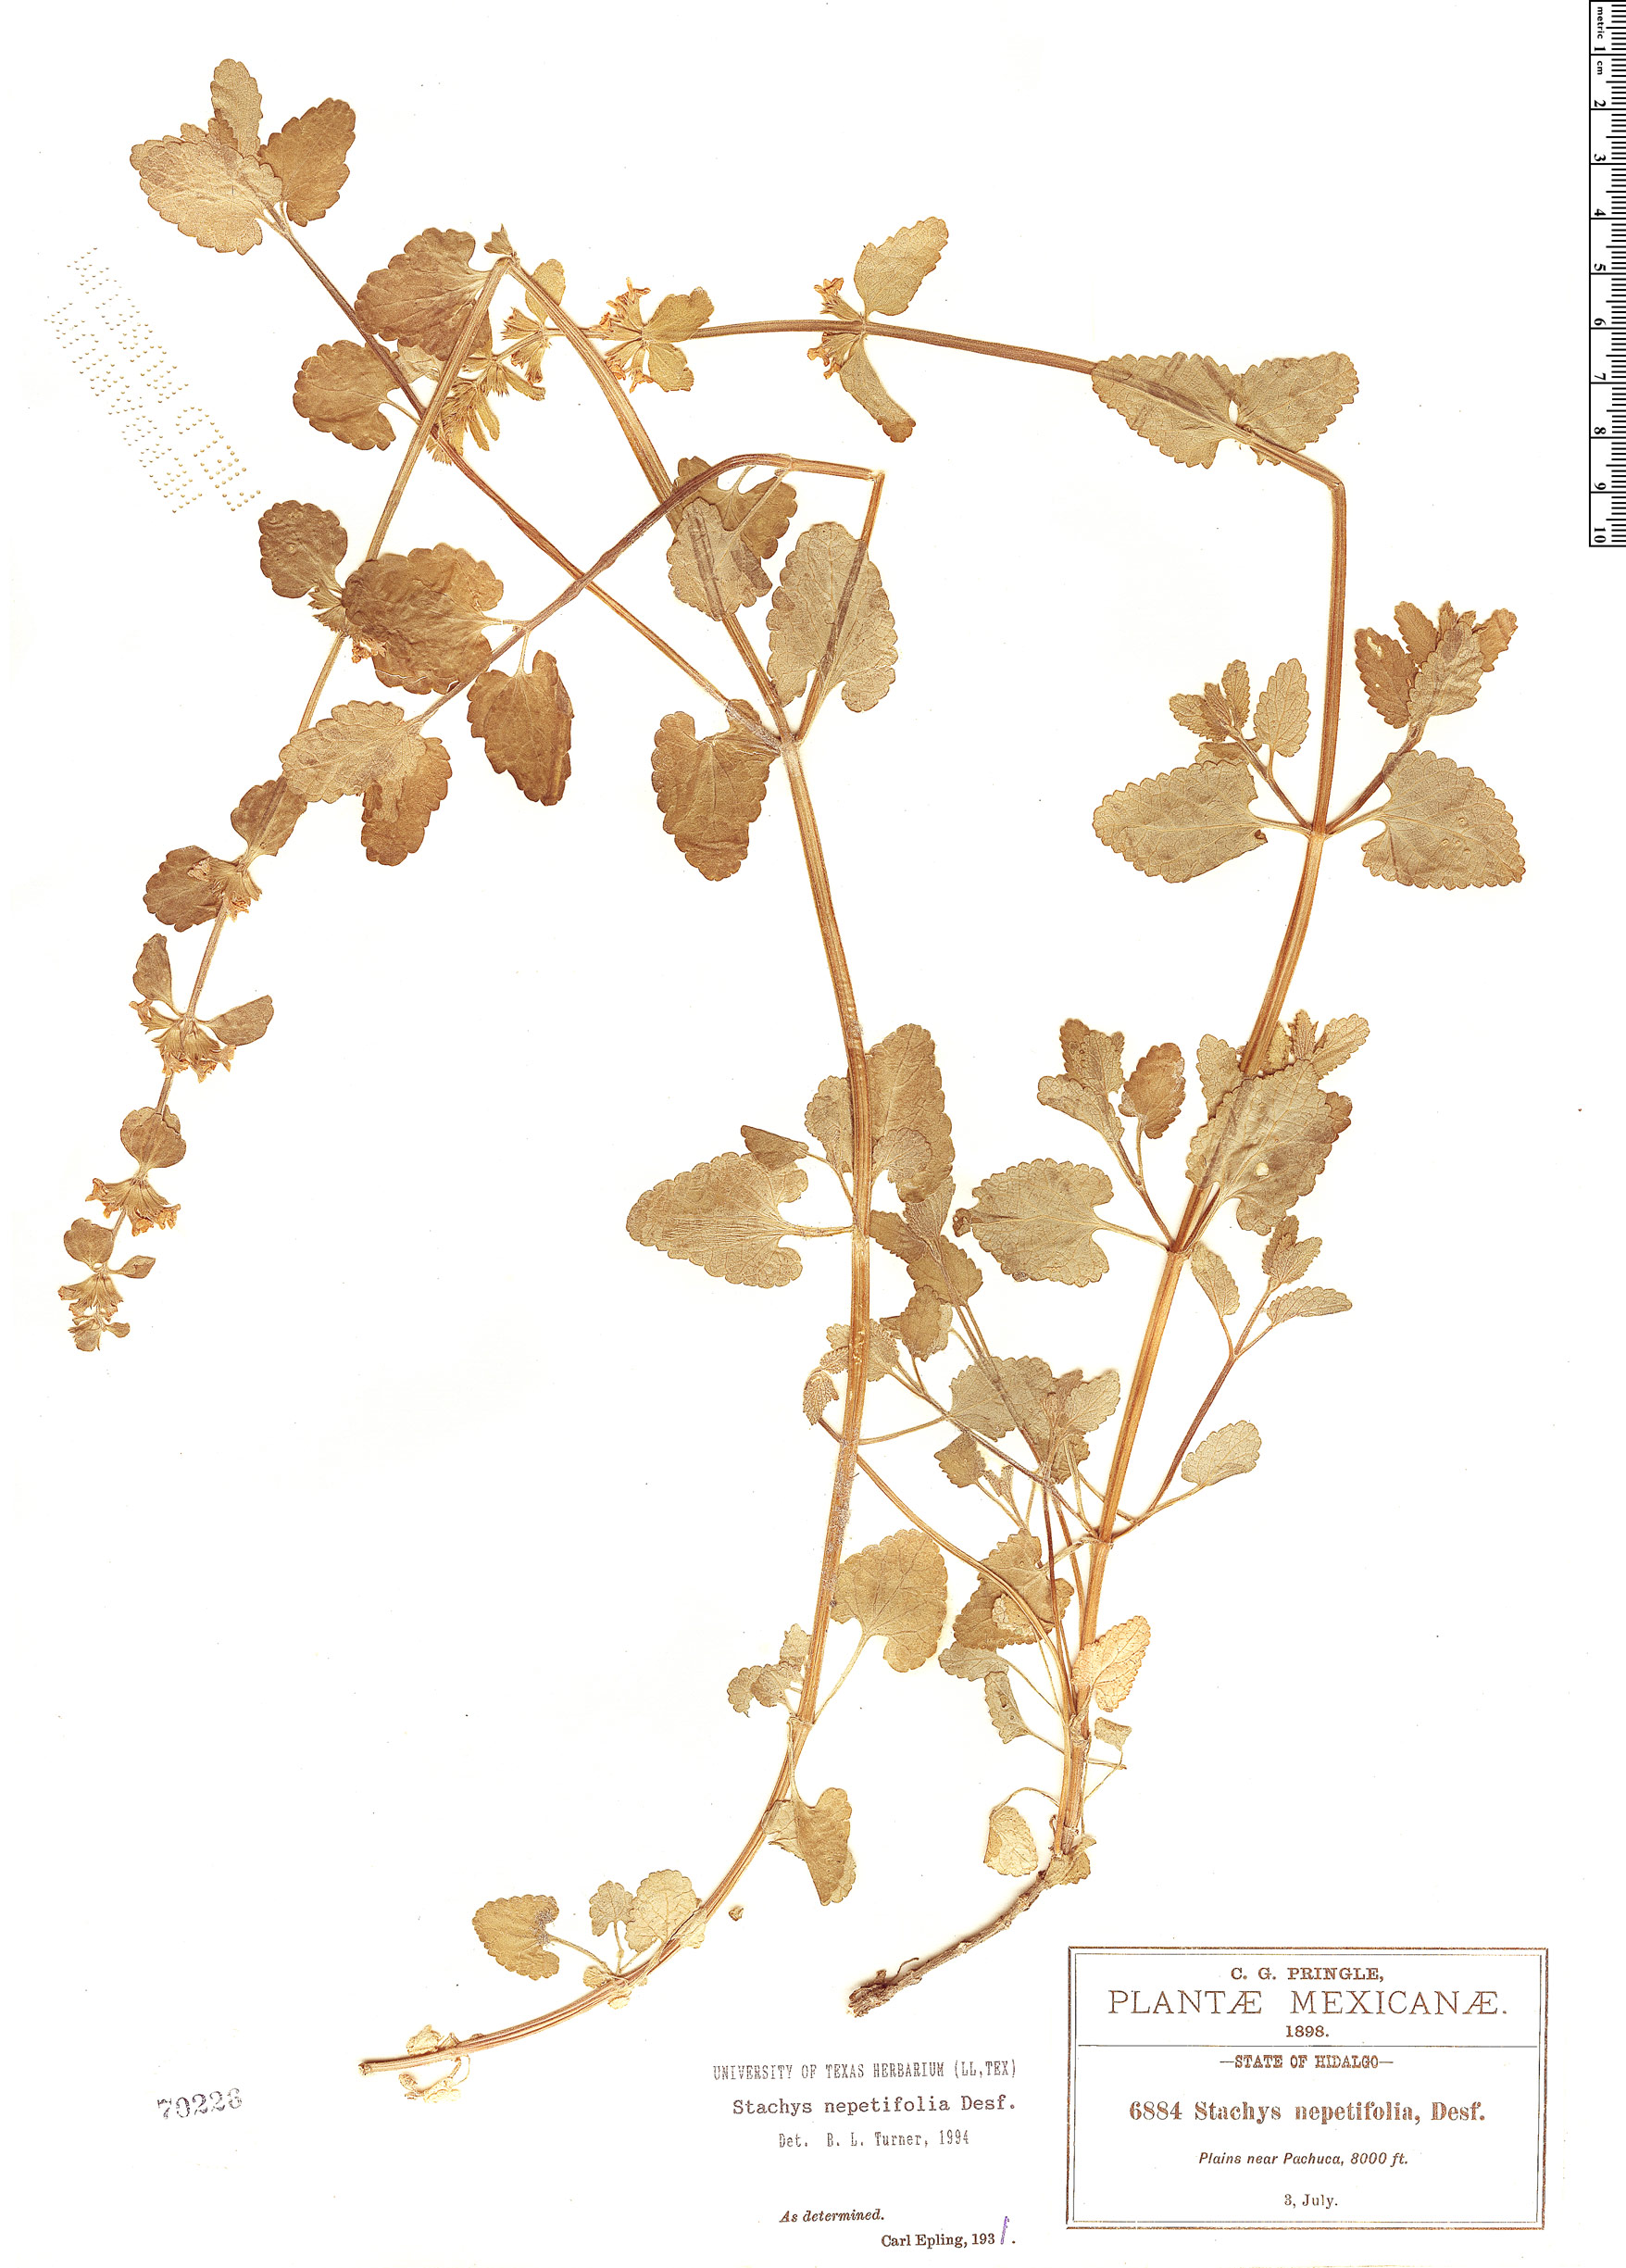 Specimen: Stachys nepetifolia